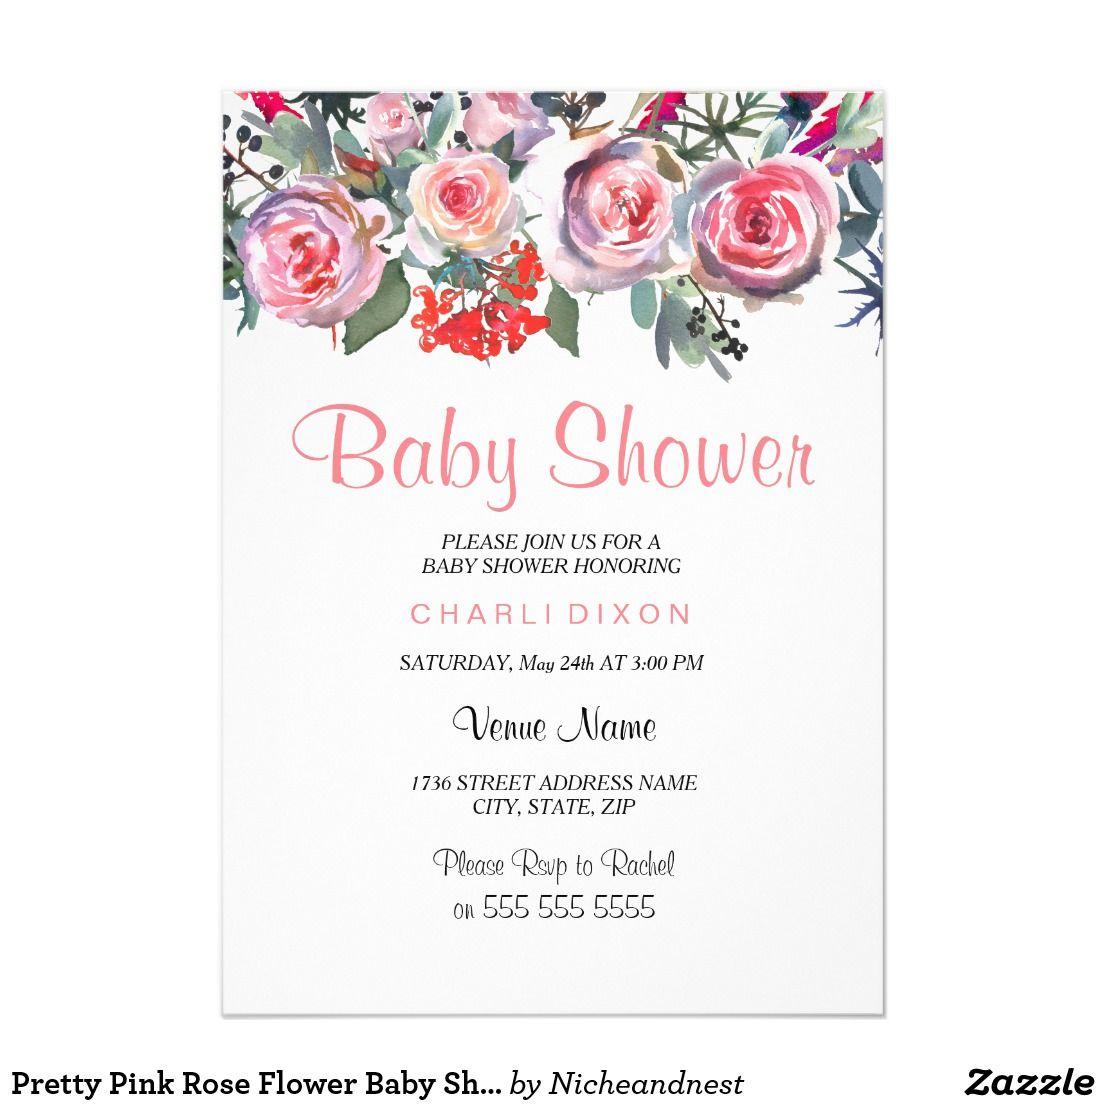 Pretty Pink Rose Flower Baby Shower Invitation | Shower invitations ...